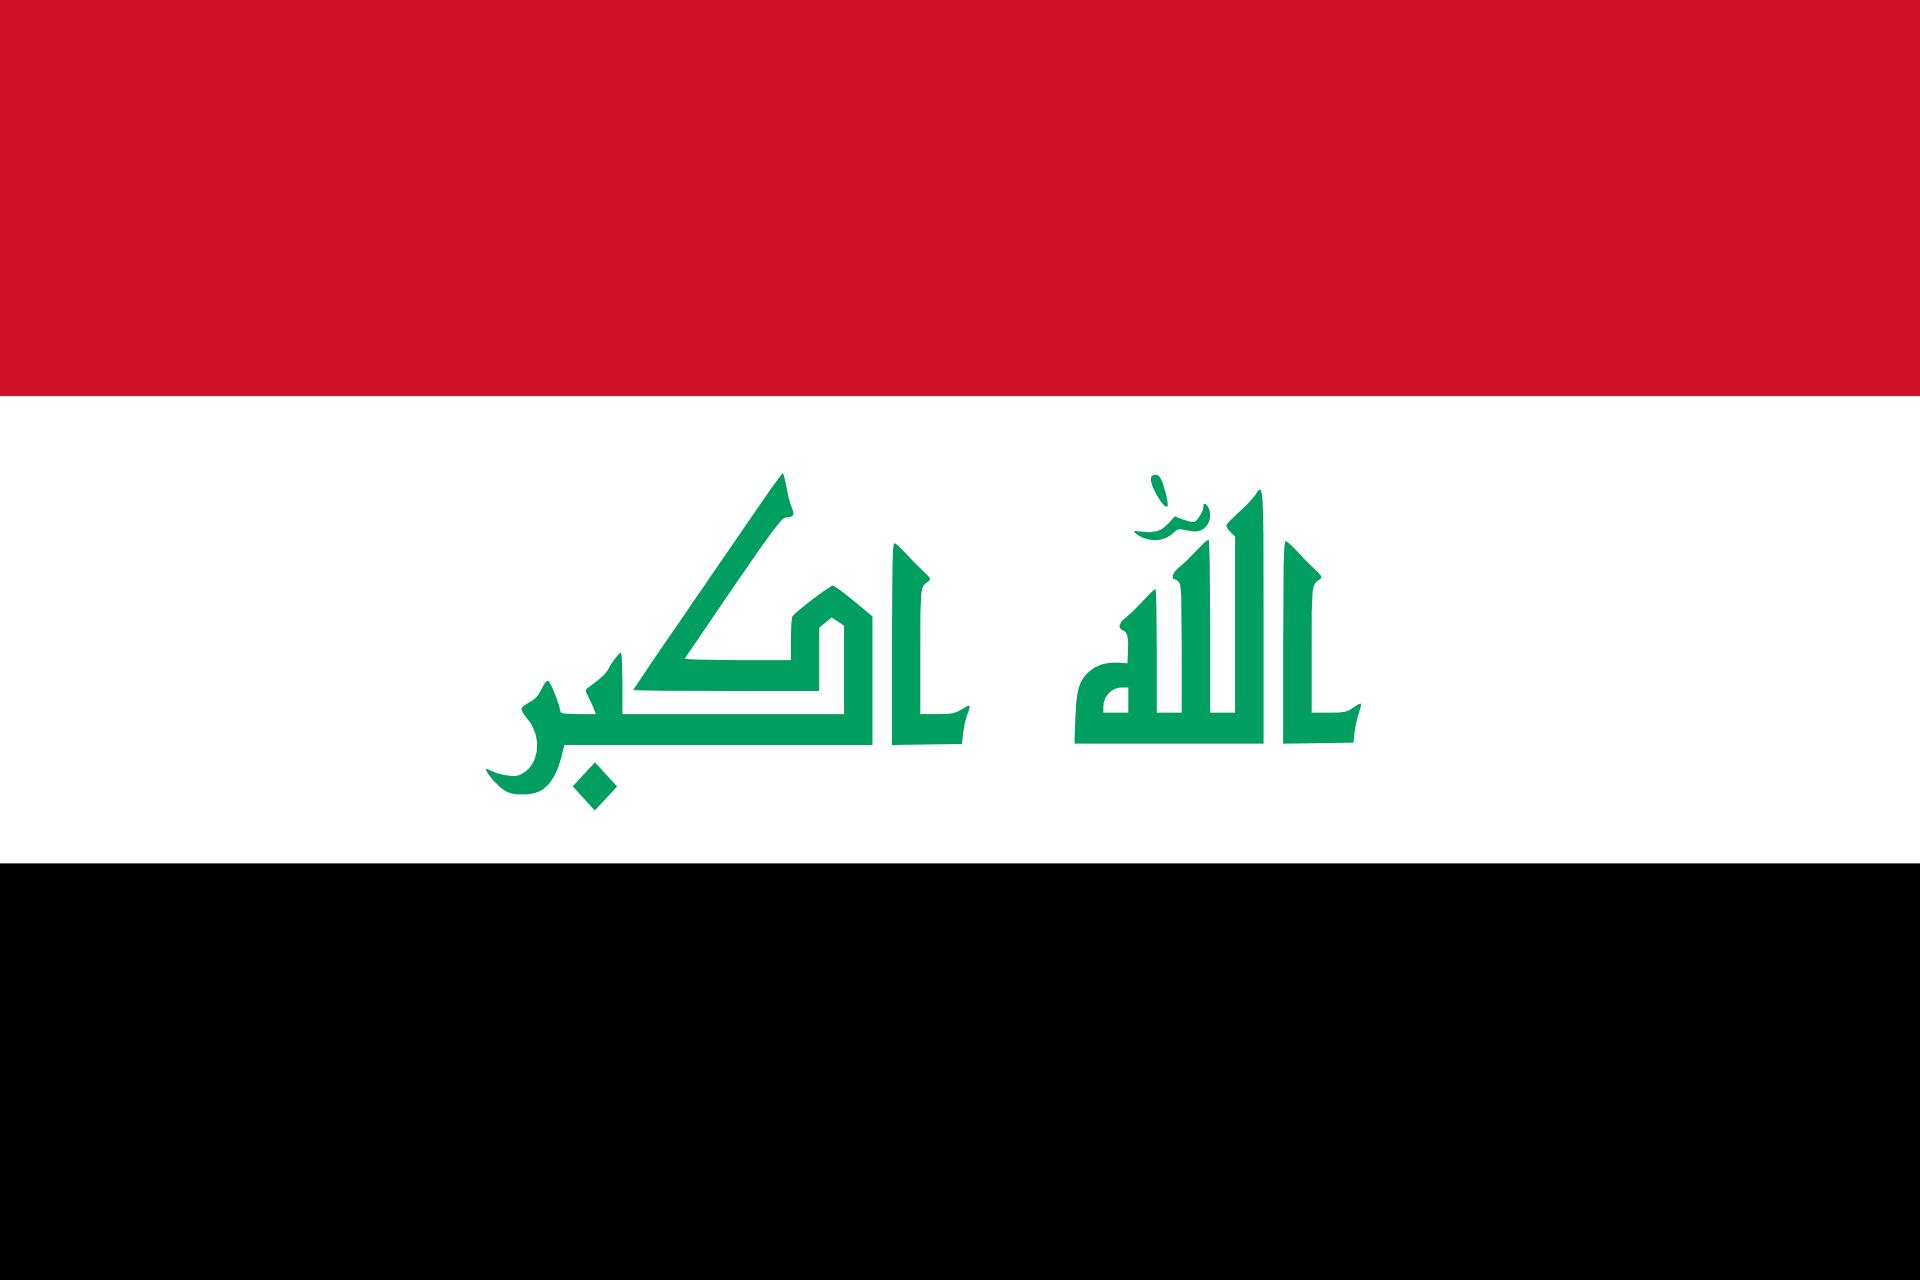 Pin By Coingebra On International Flags Pro Nepal Travel Iraq Flag Iraq